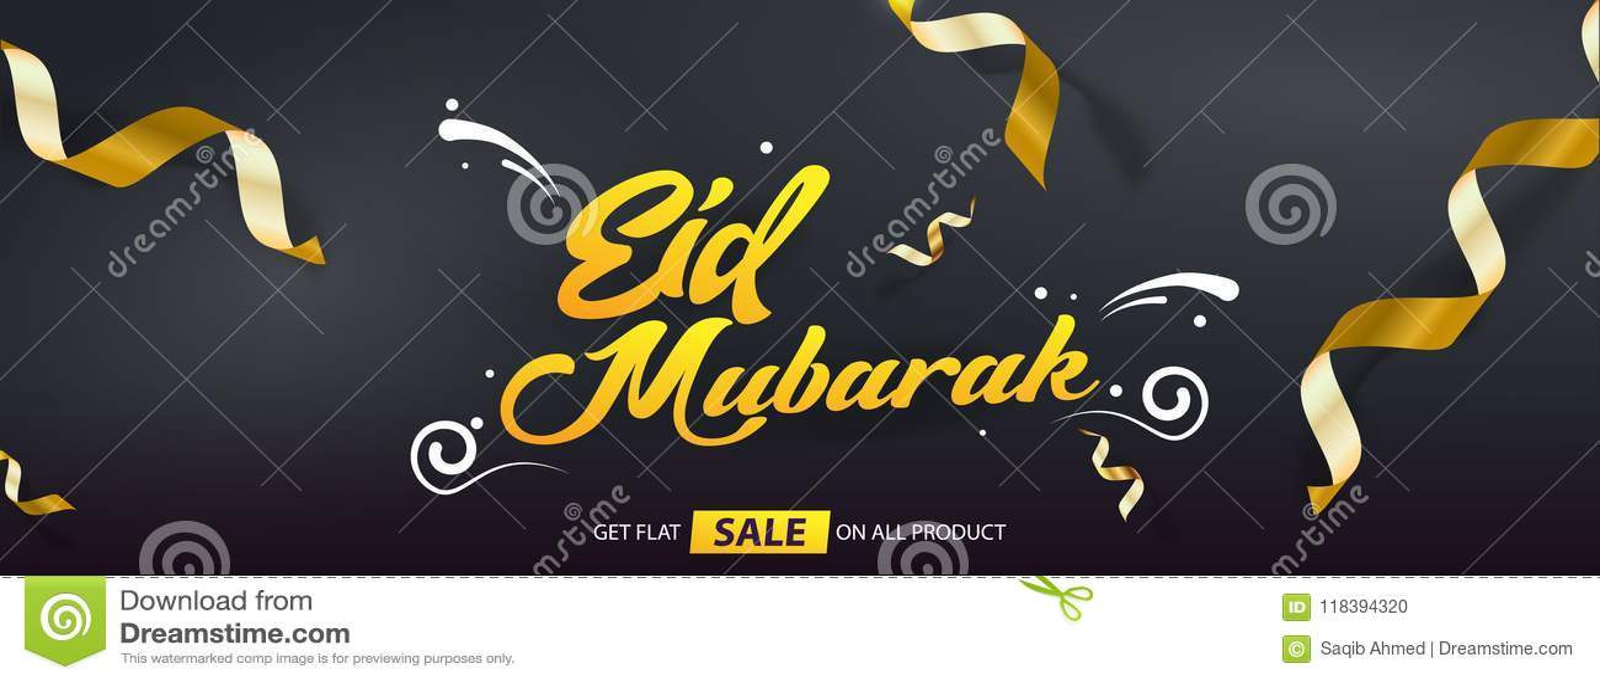 Eid Mubarak Sales offer vector template design cover banner